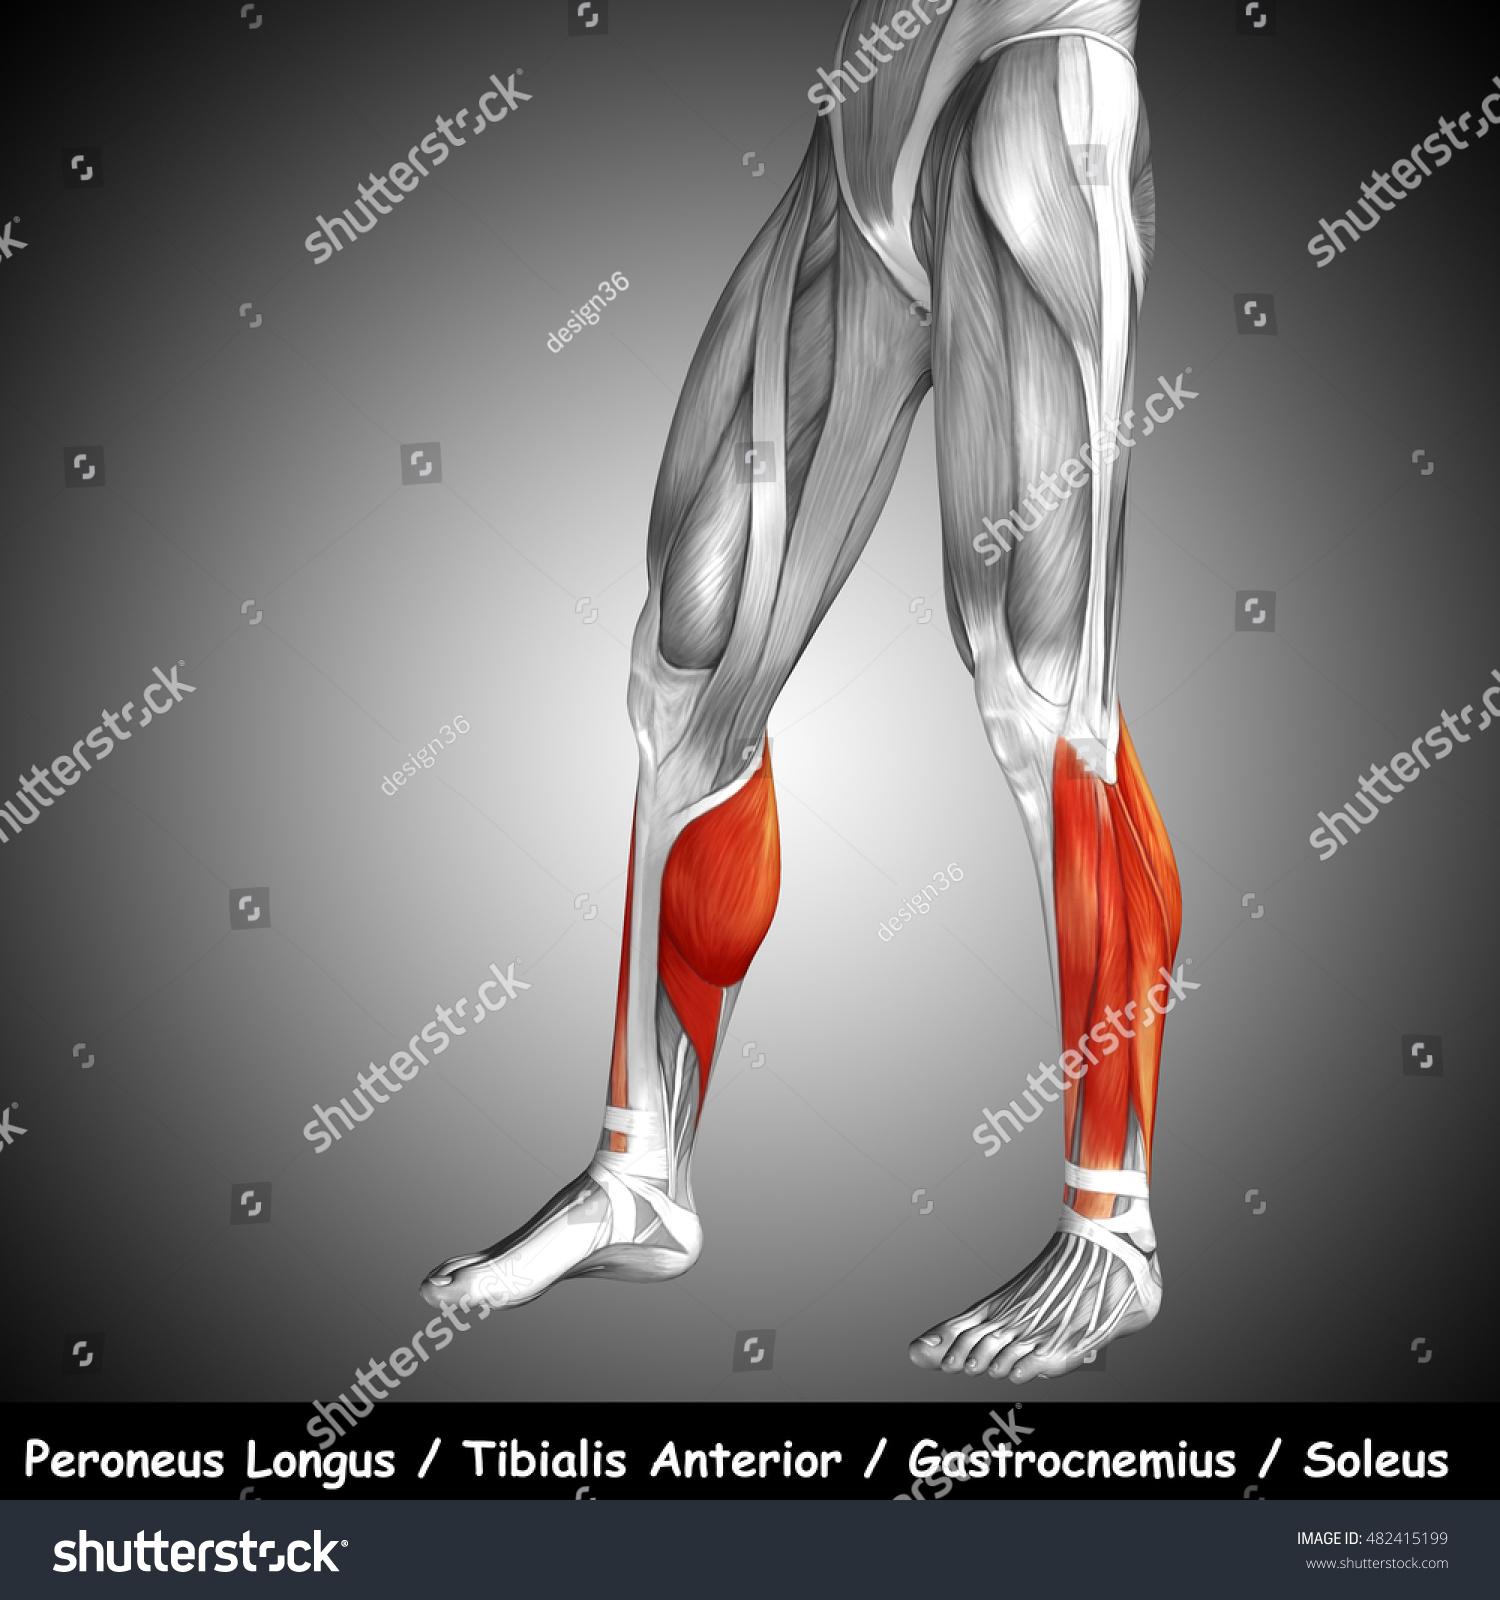 Peroneus Longus Tendon Anatomy 683584 Follow4morefo